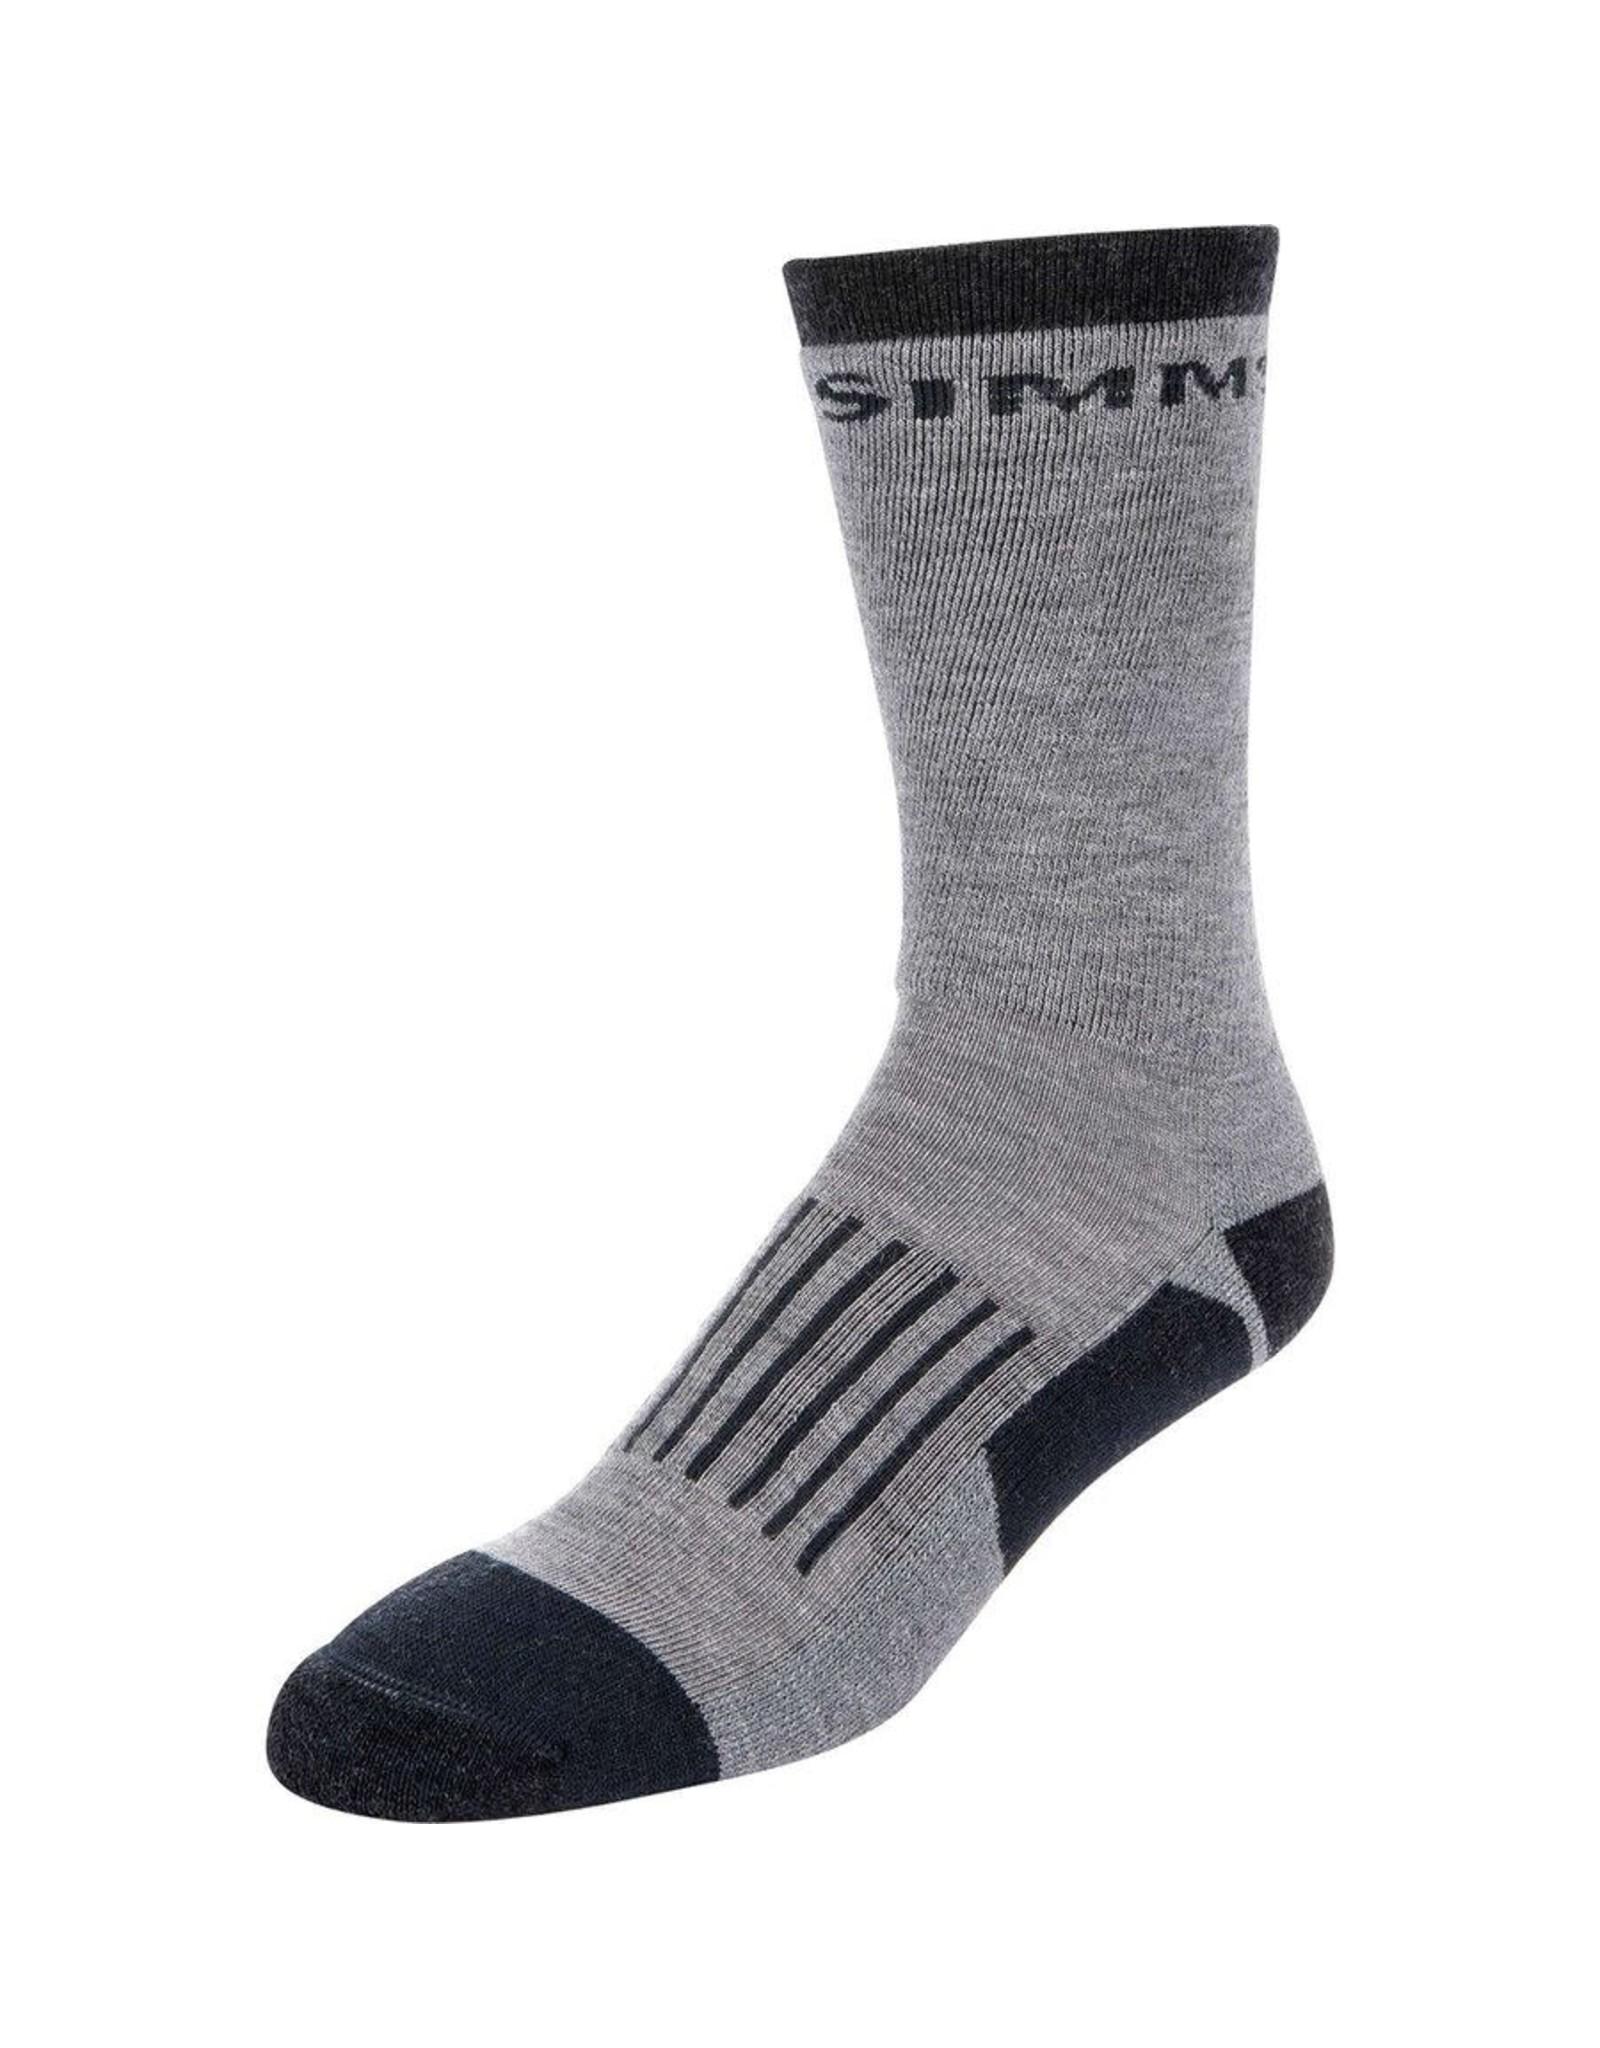 Simms M's Merino Midweight Hiker Sock